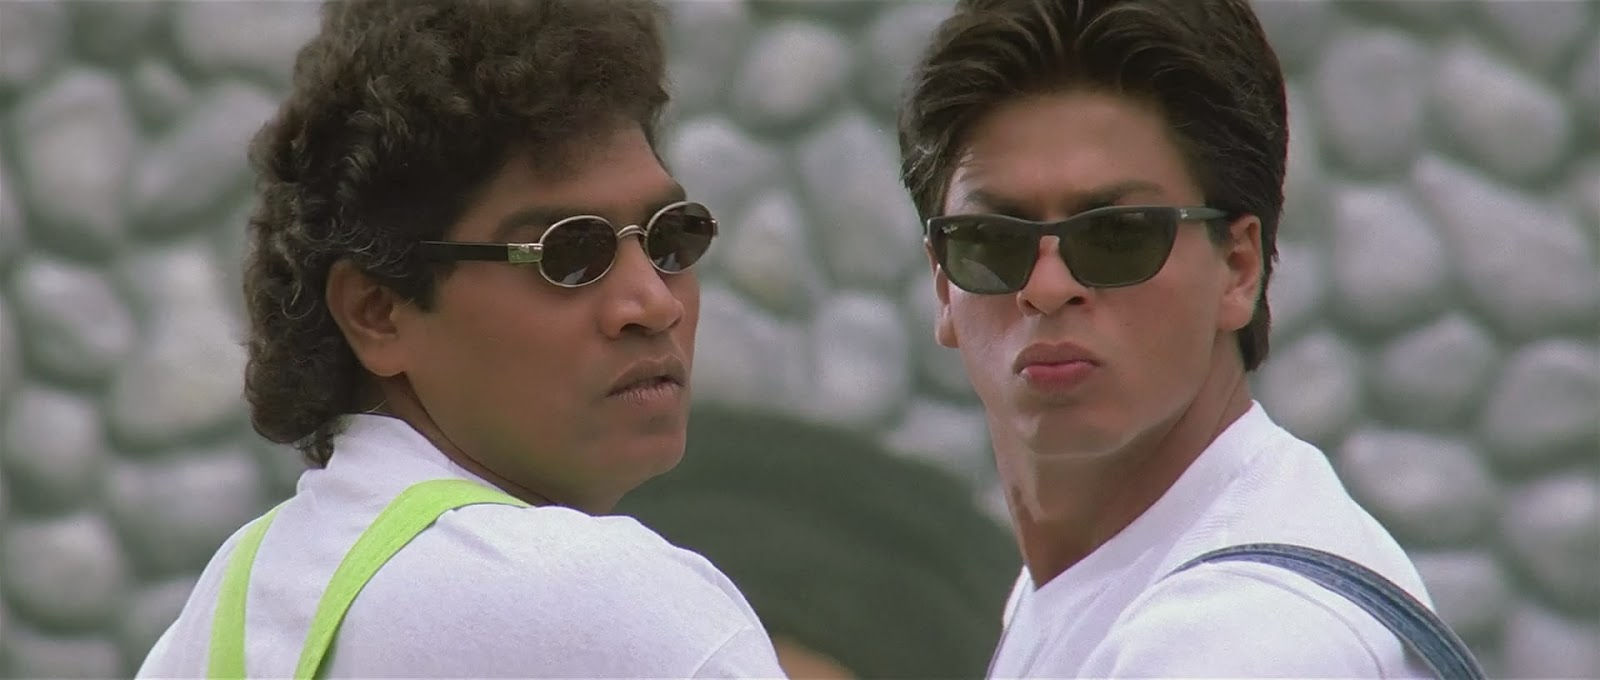 HitS of SRK Music Videos Bluray 1080p DTS x264 Subs -TmG - Multi-Links